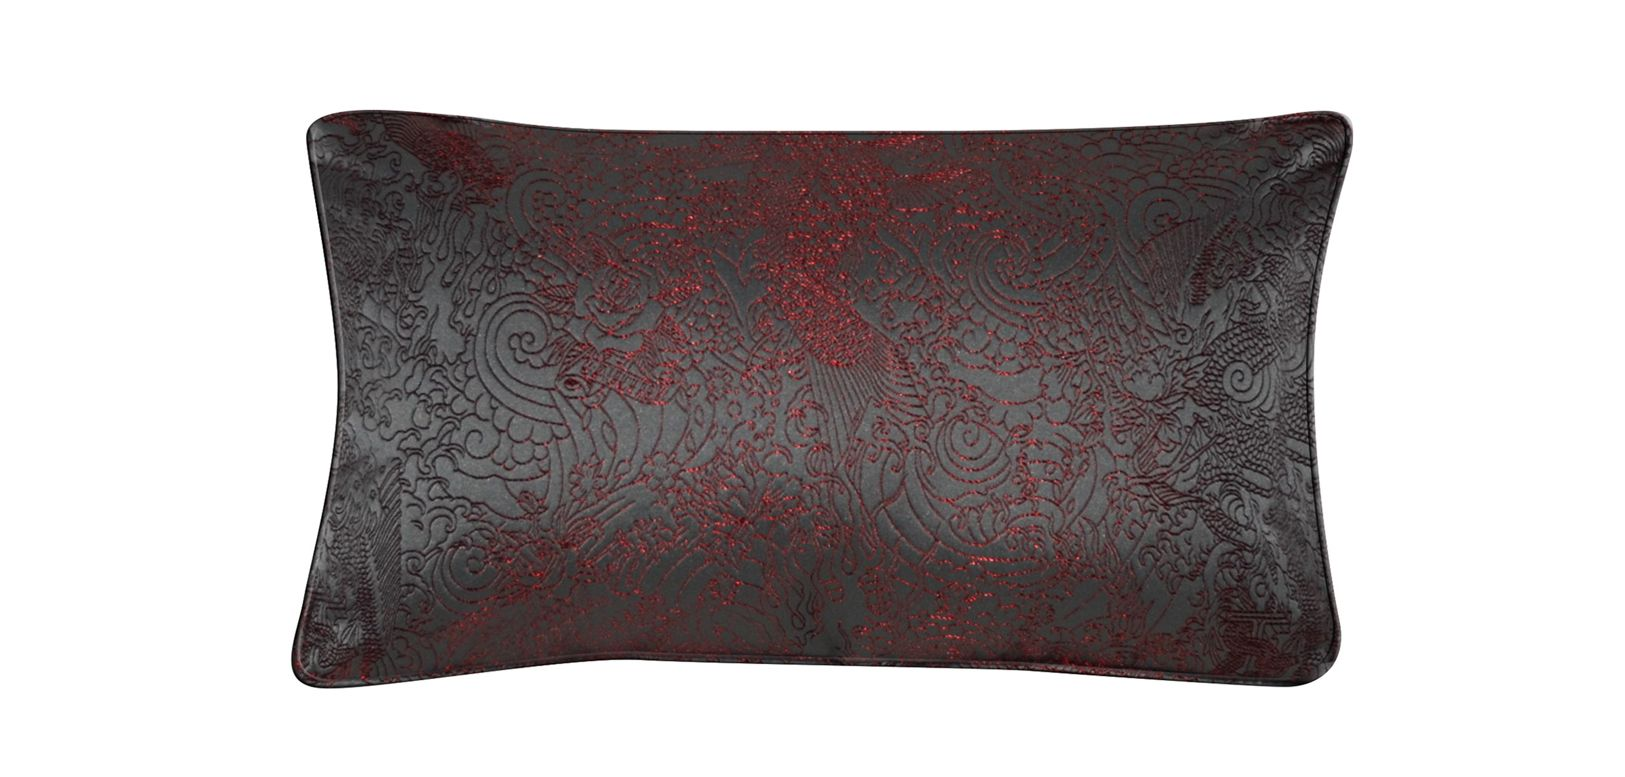 coussin gravure jean paul gaultier roche bobois. Black Bedroom Furniture Sets. Home Design Ideas